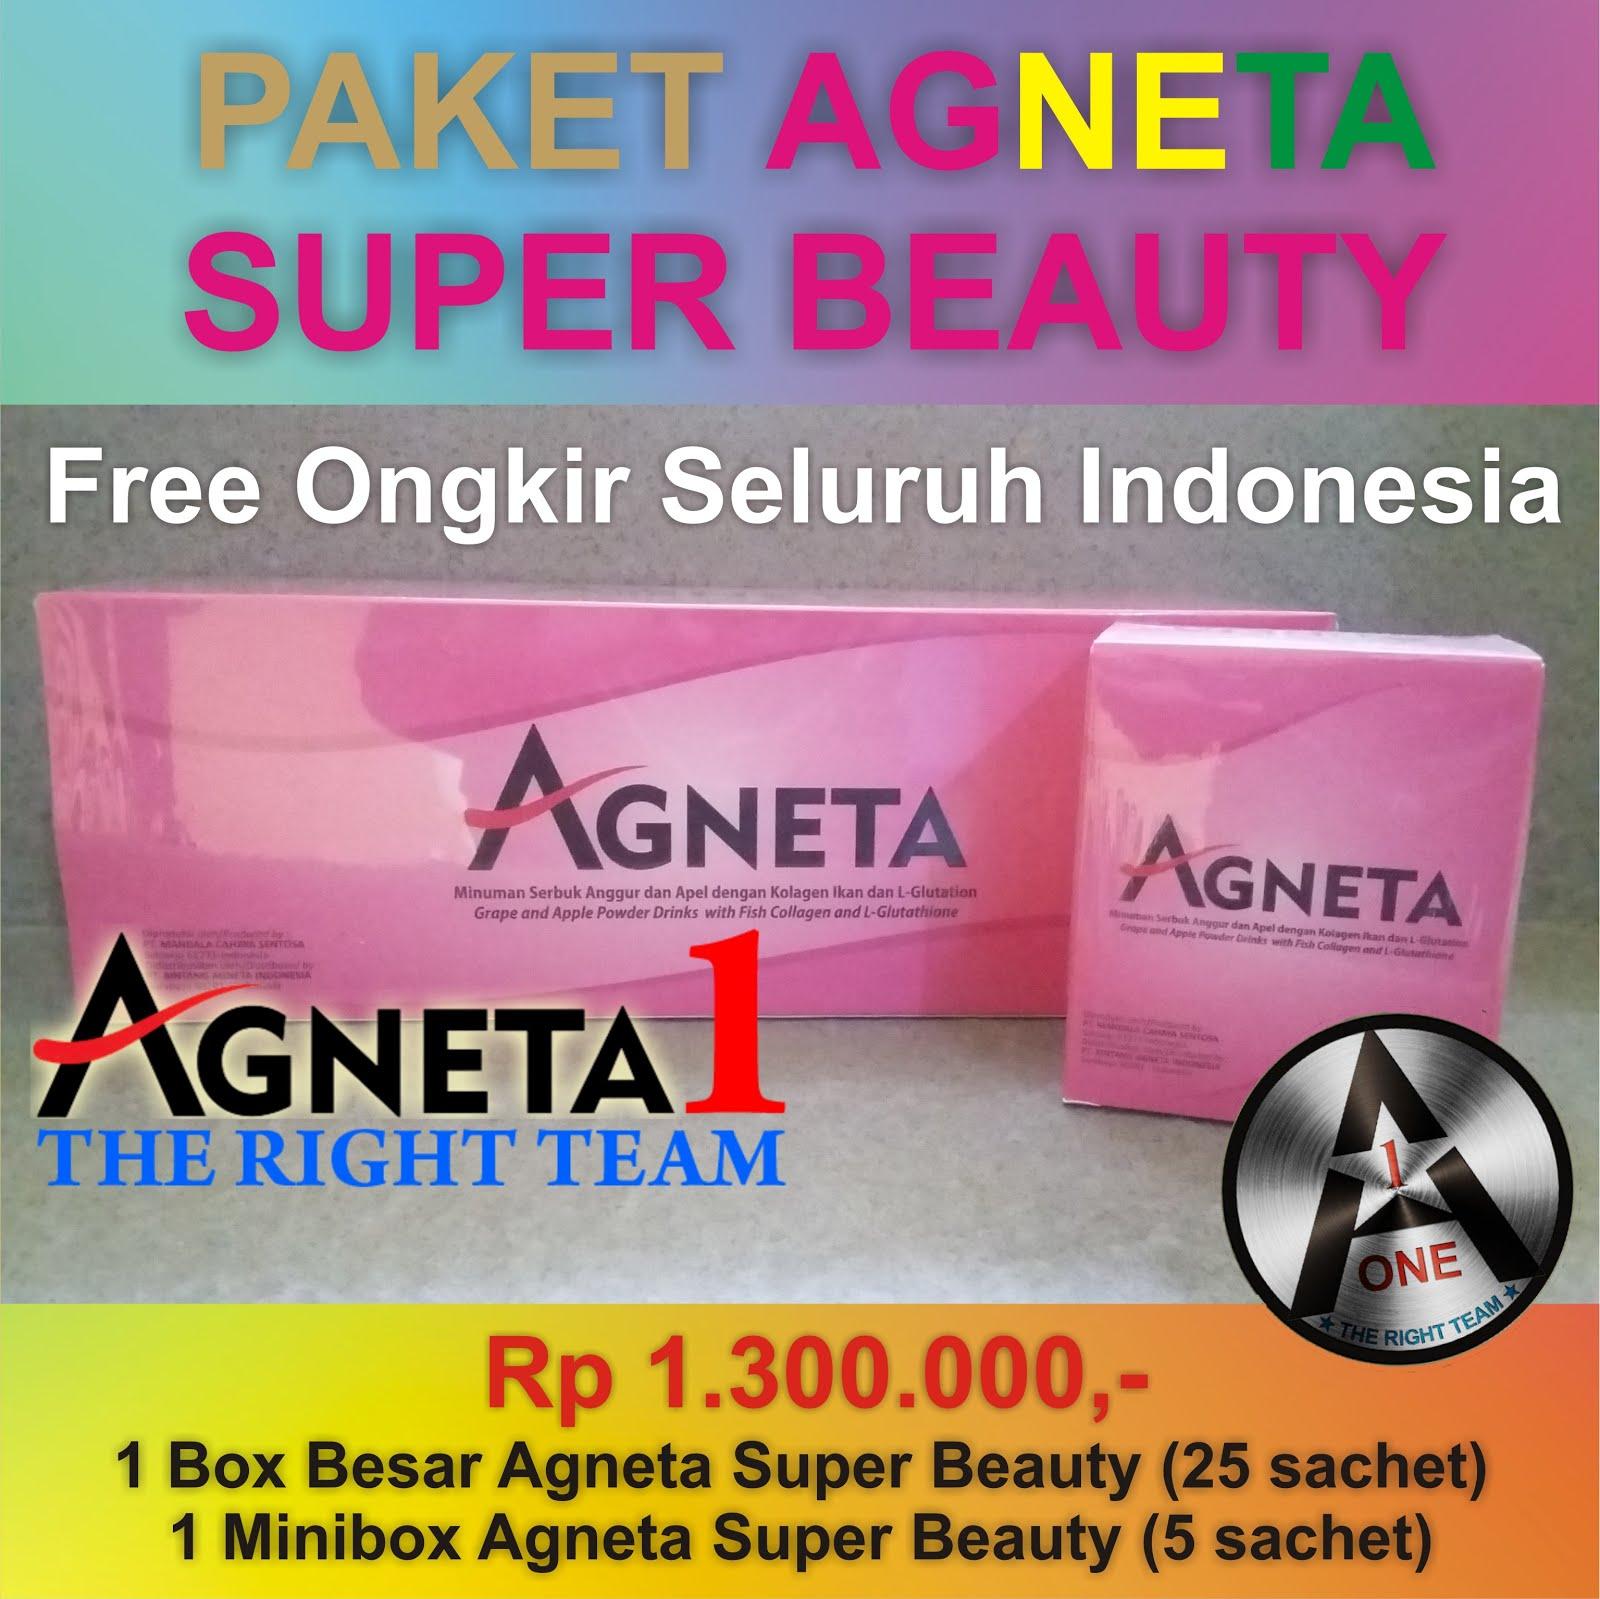 Paket Agneta Super Beauty (Anti Aging)